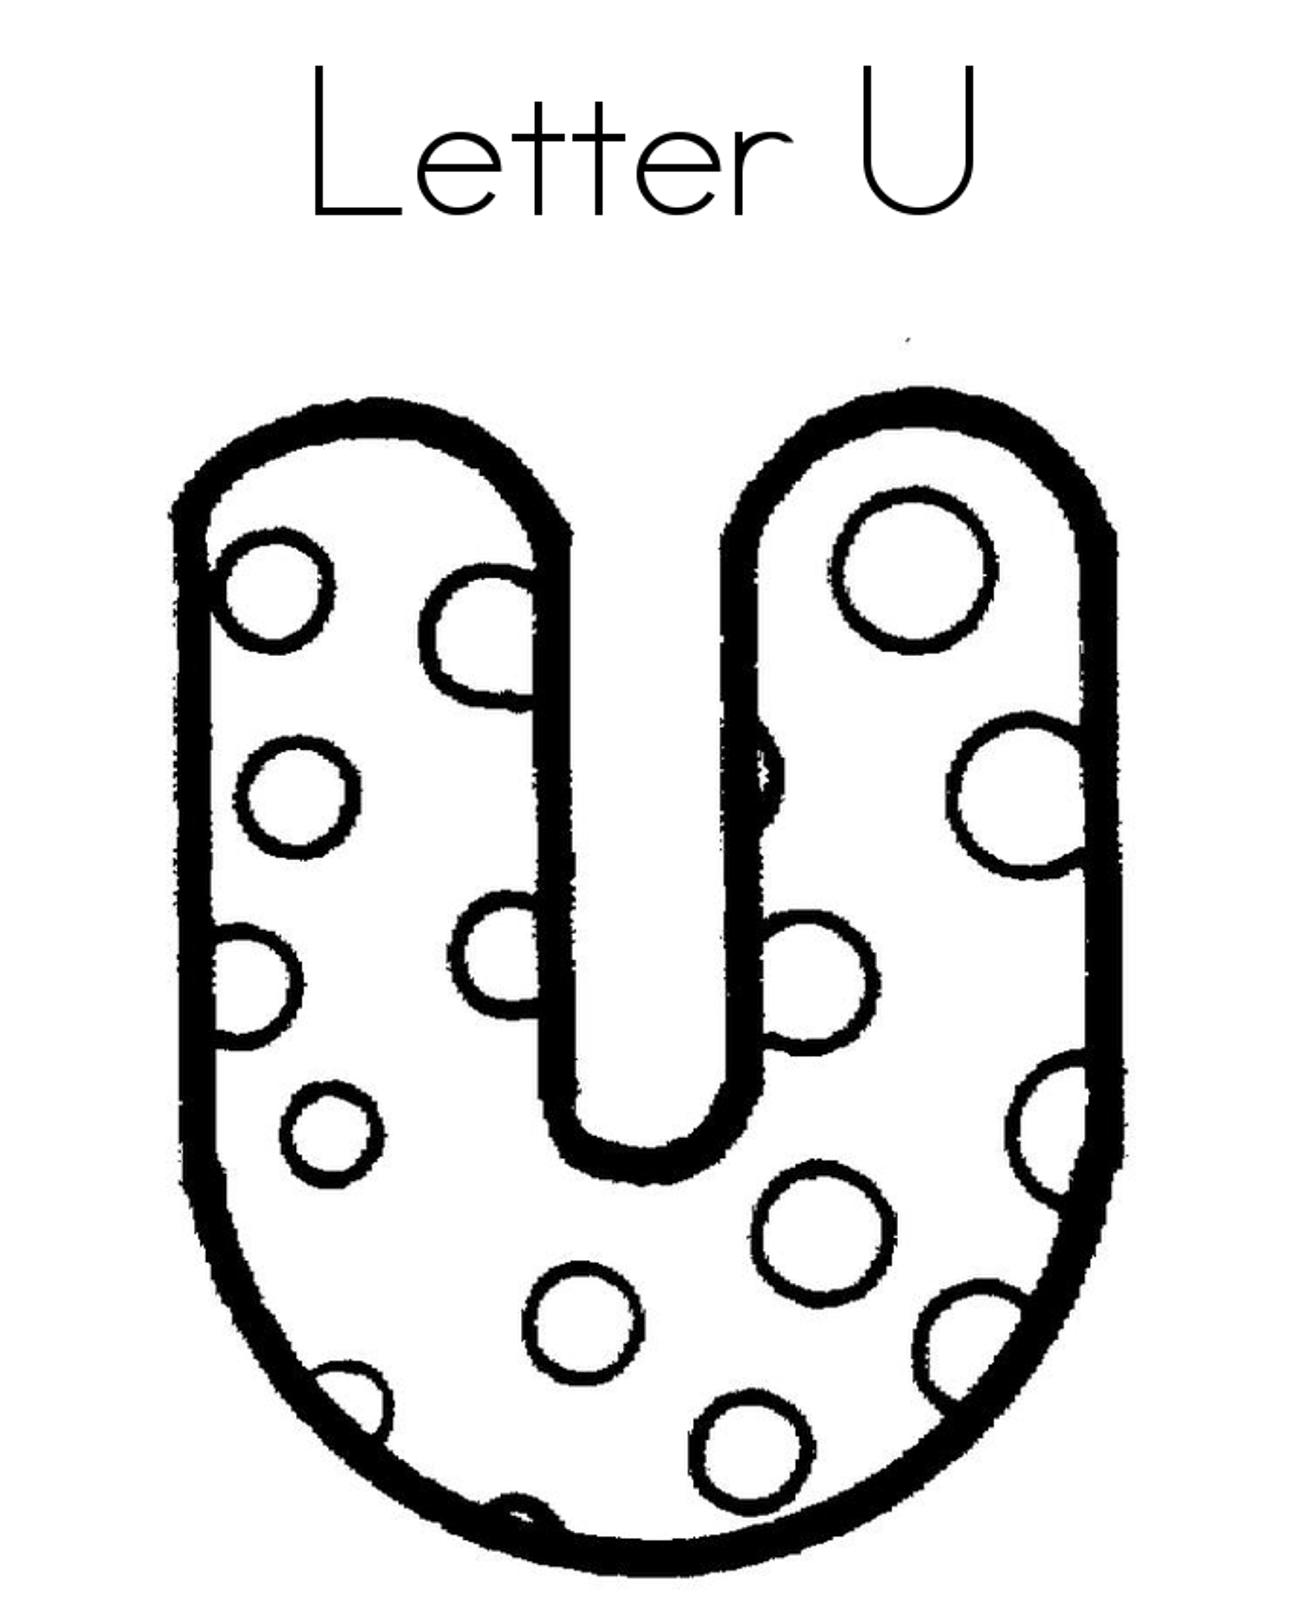 Letter U Dots Alphabet Coloring Pages Free